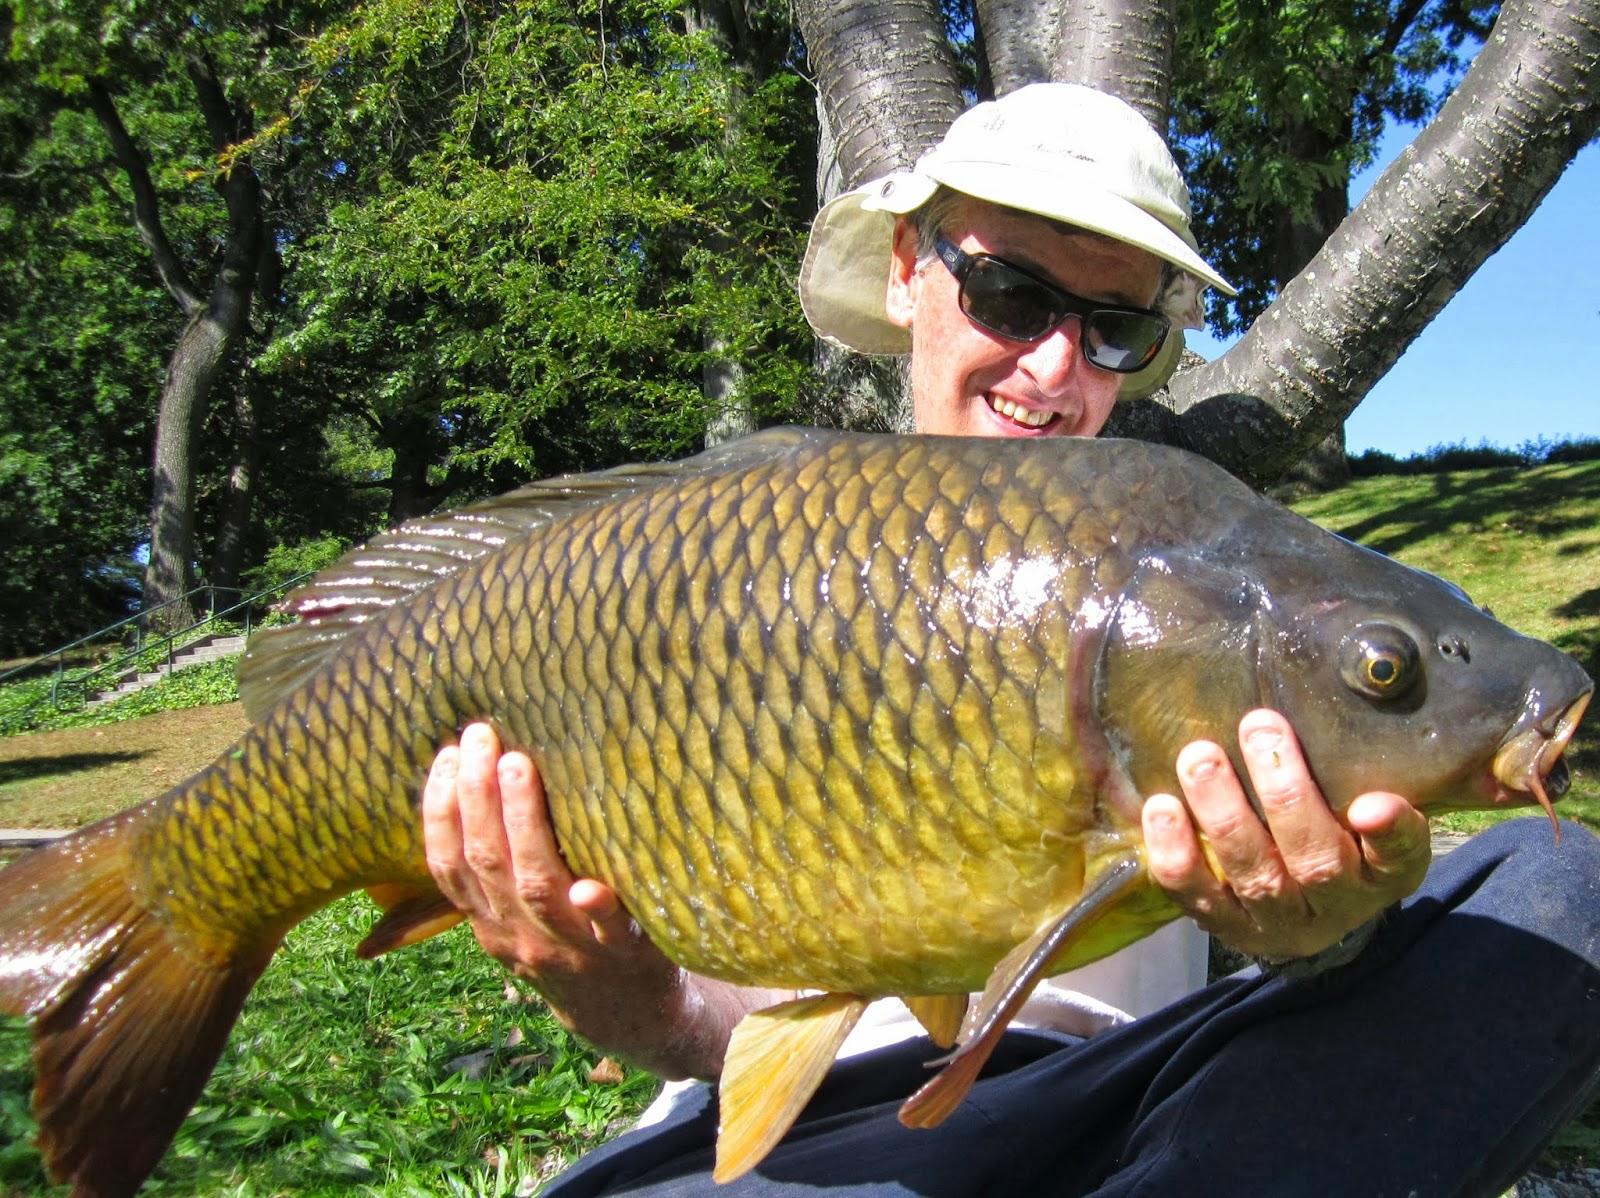 Rhode Island Carp Fishing: Big Carp in Small Spots